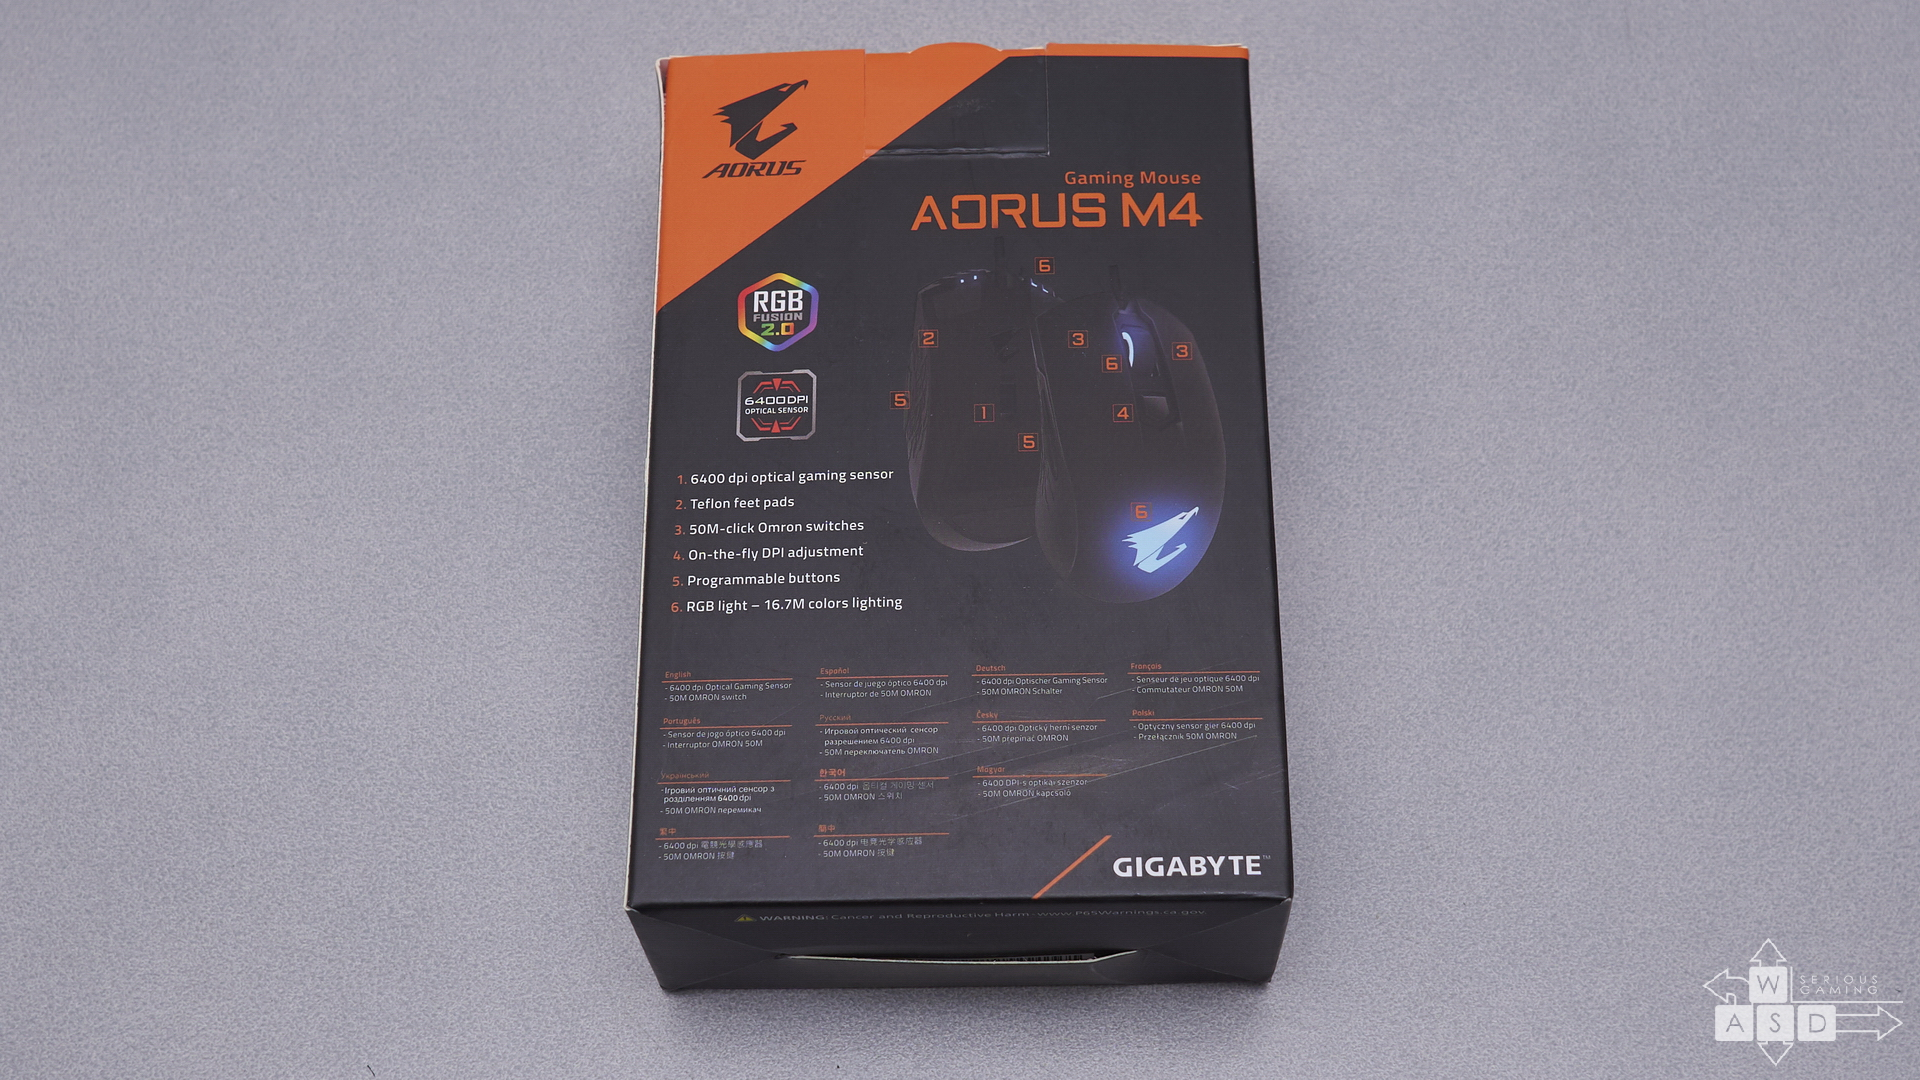 Gigabyte Aorus M4 review | WASD.ro